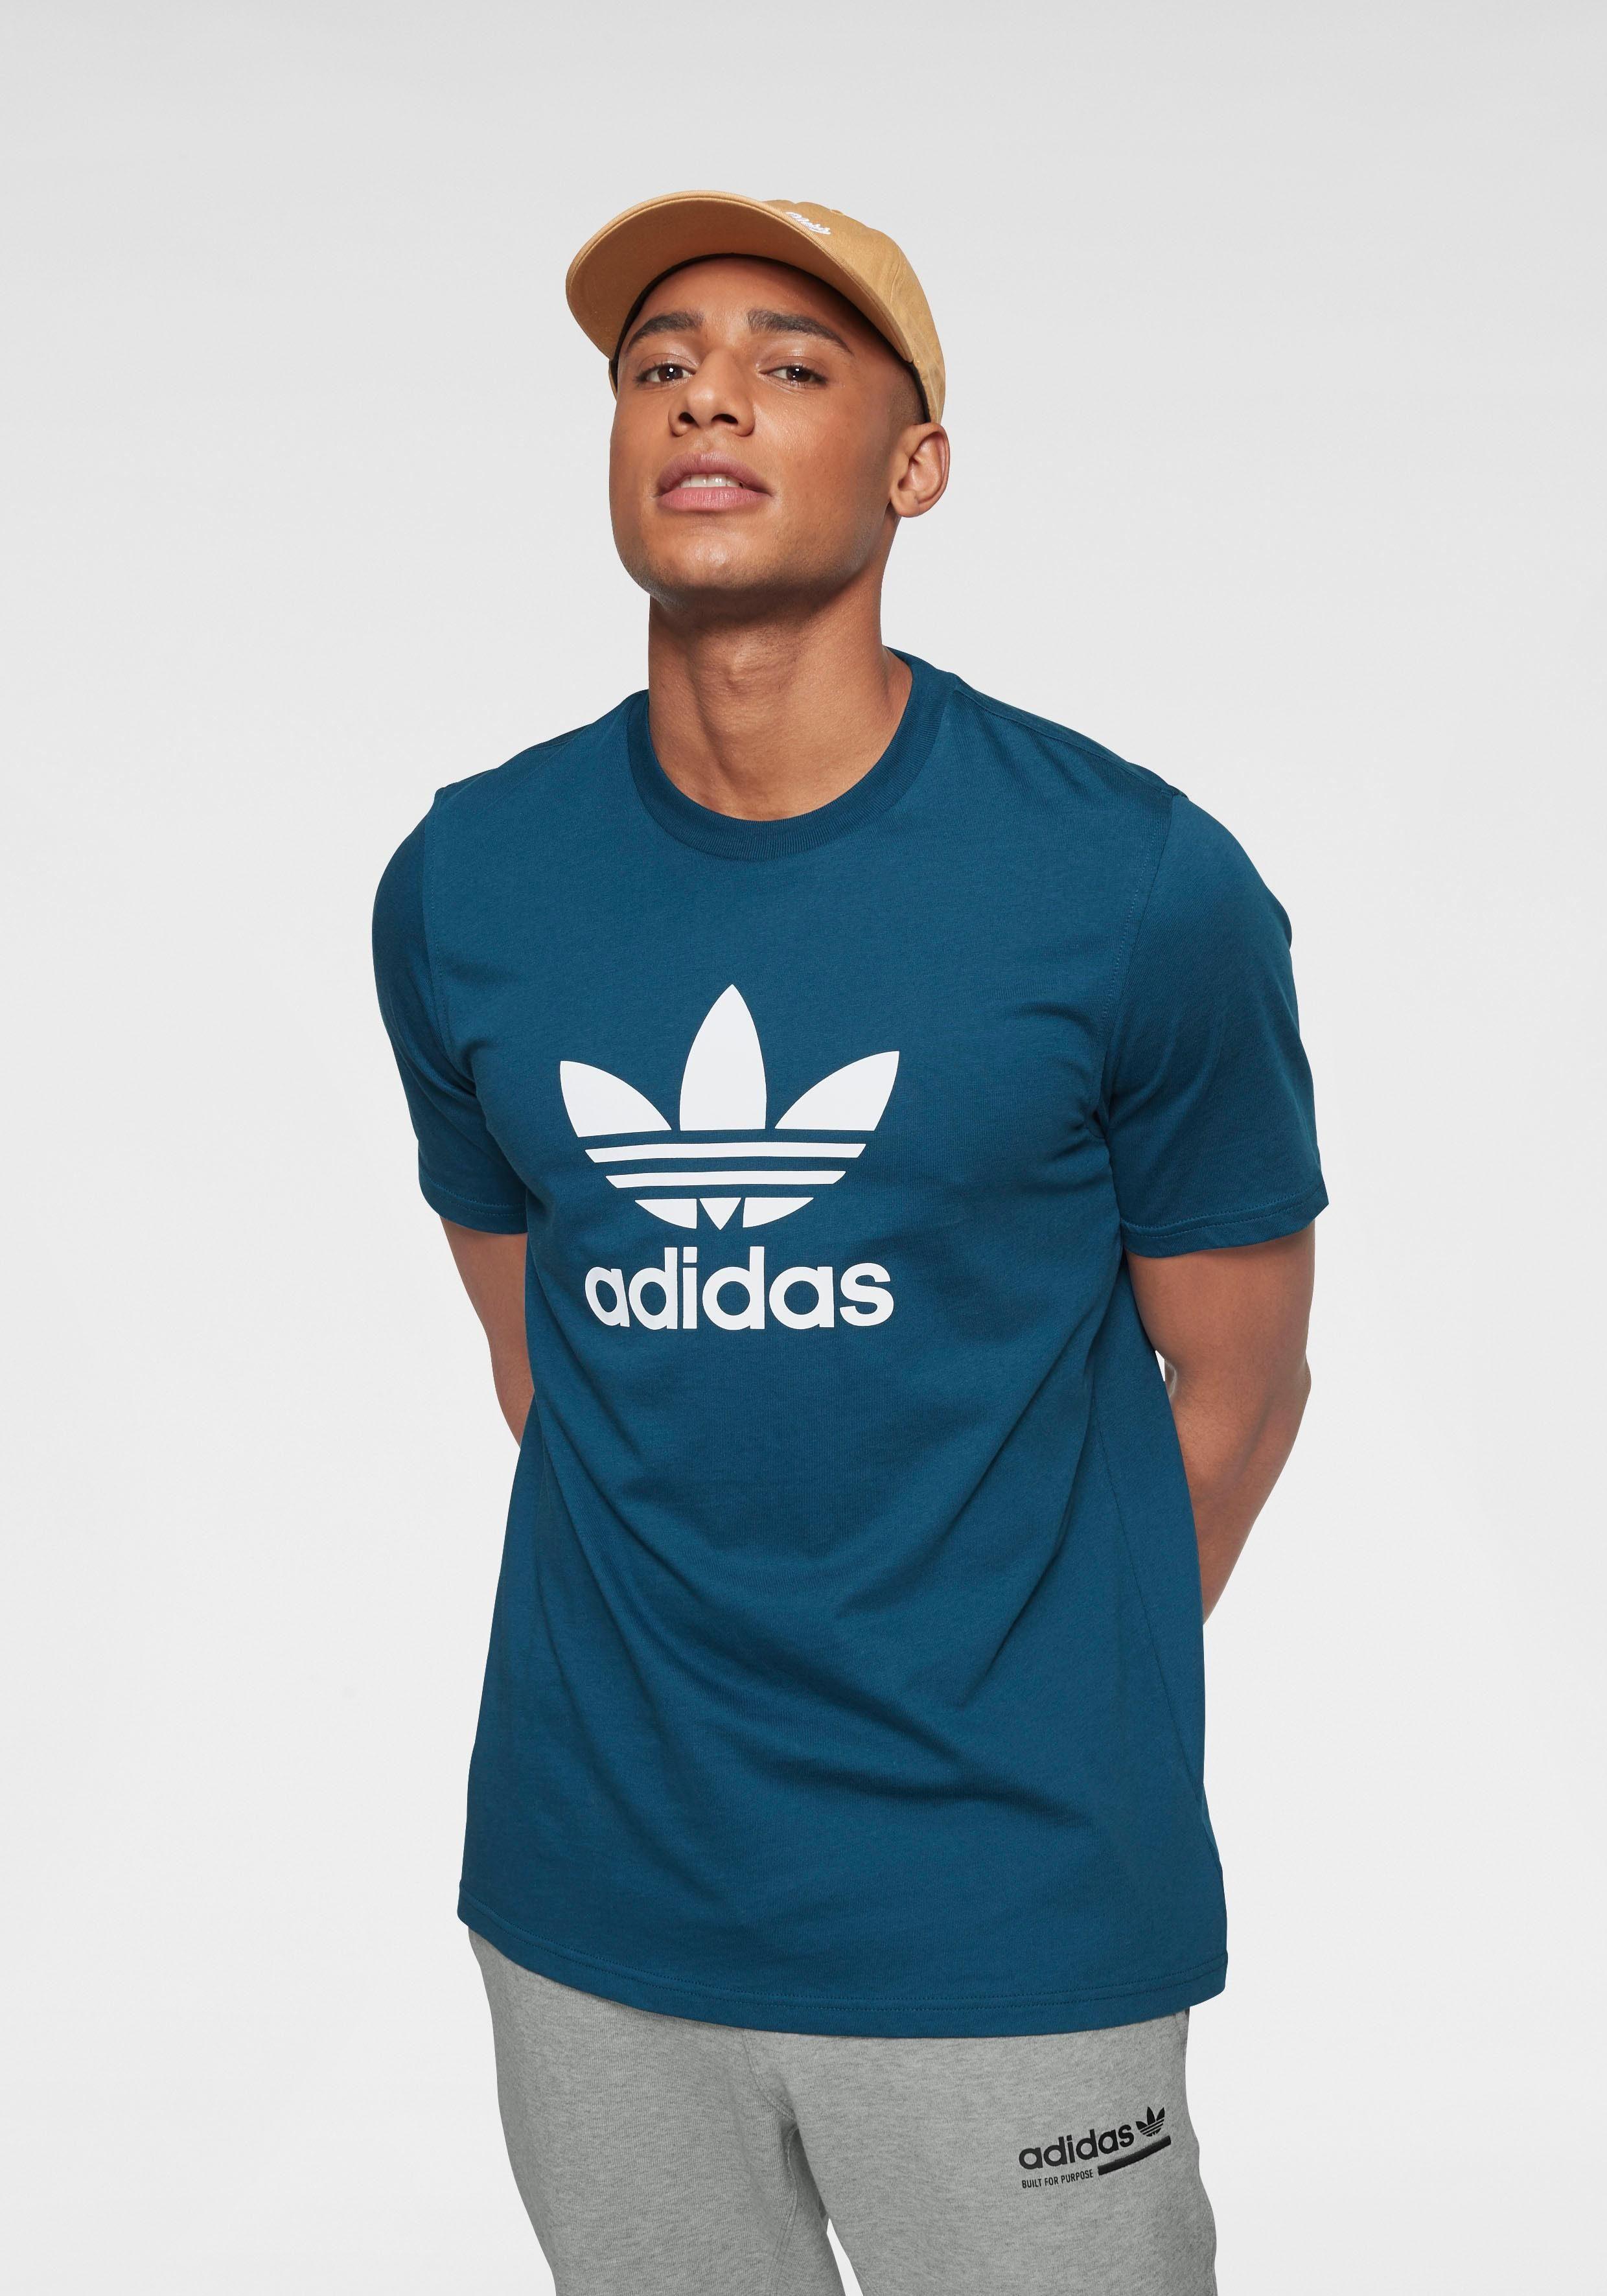 adidas Originals T Shirt »TREFOIL T SHIRT« kaufen | OTTO